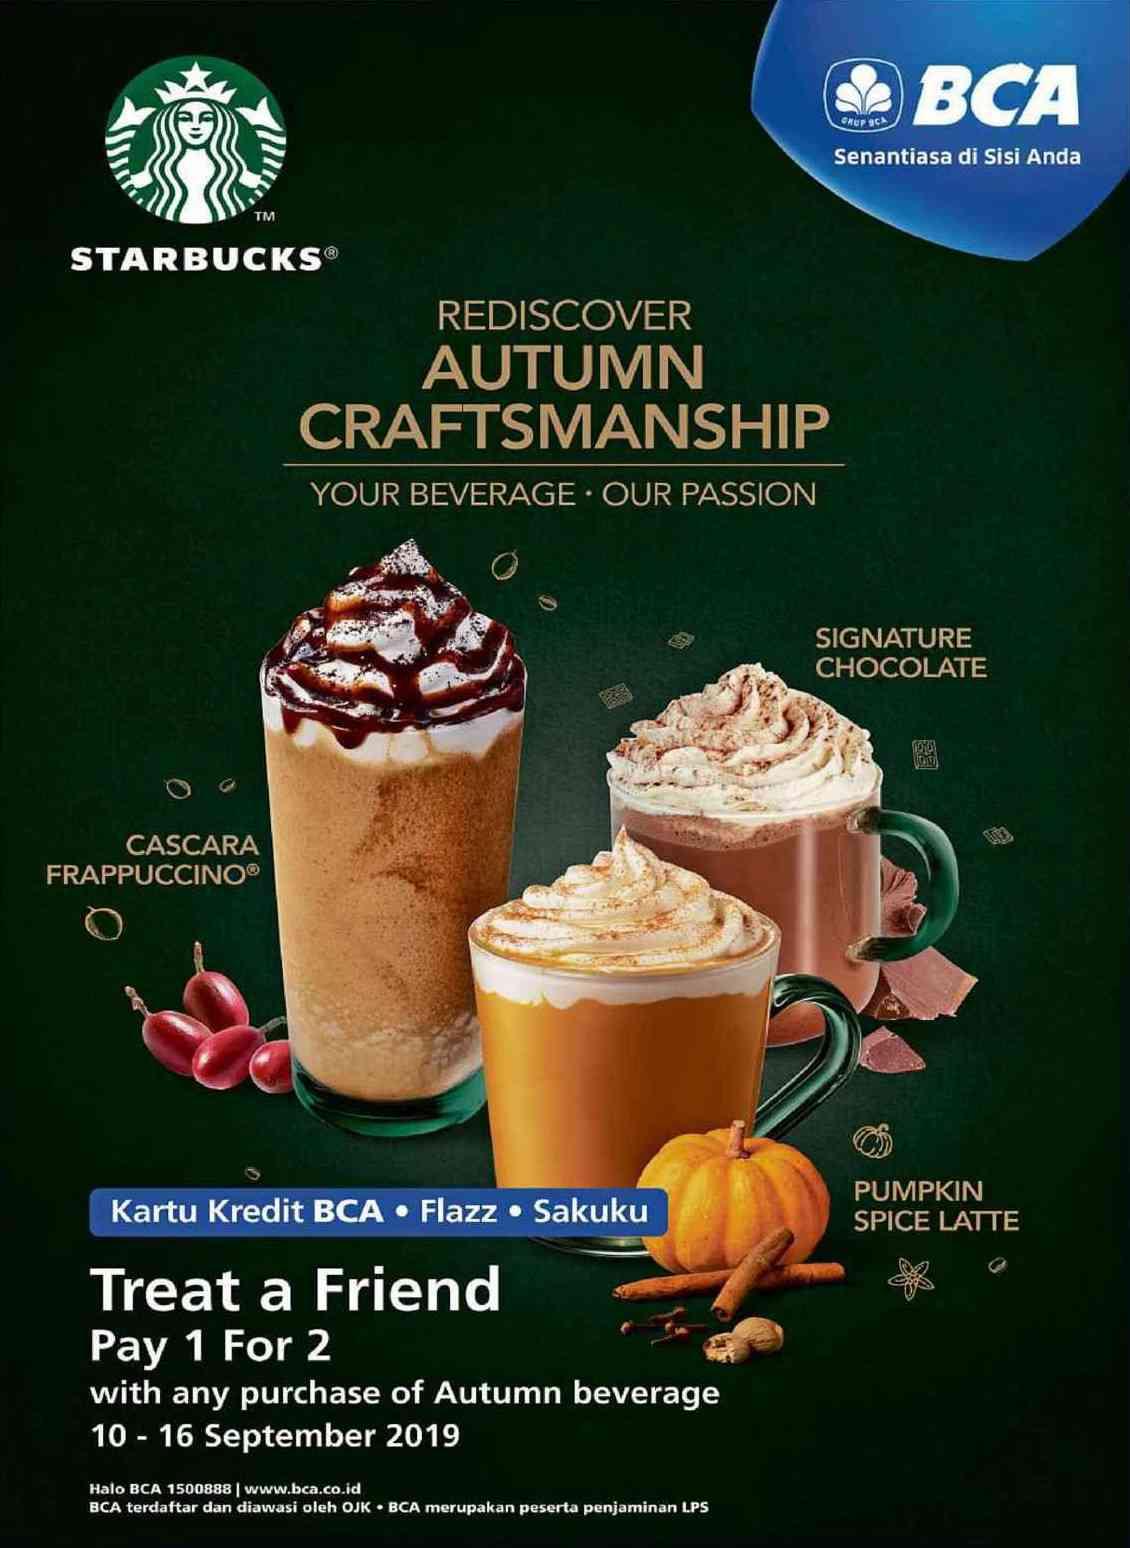 Starbucks Promo Pay 1 For 2 Beli minuman spesial Autumn Gratis minuman dengan Kartu BCA